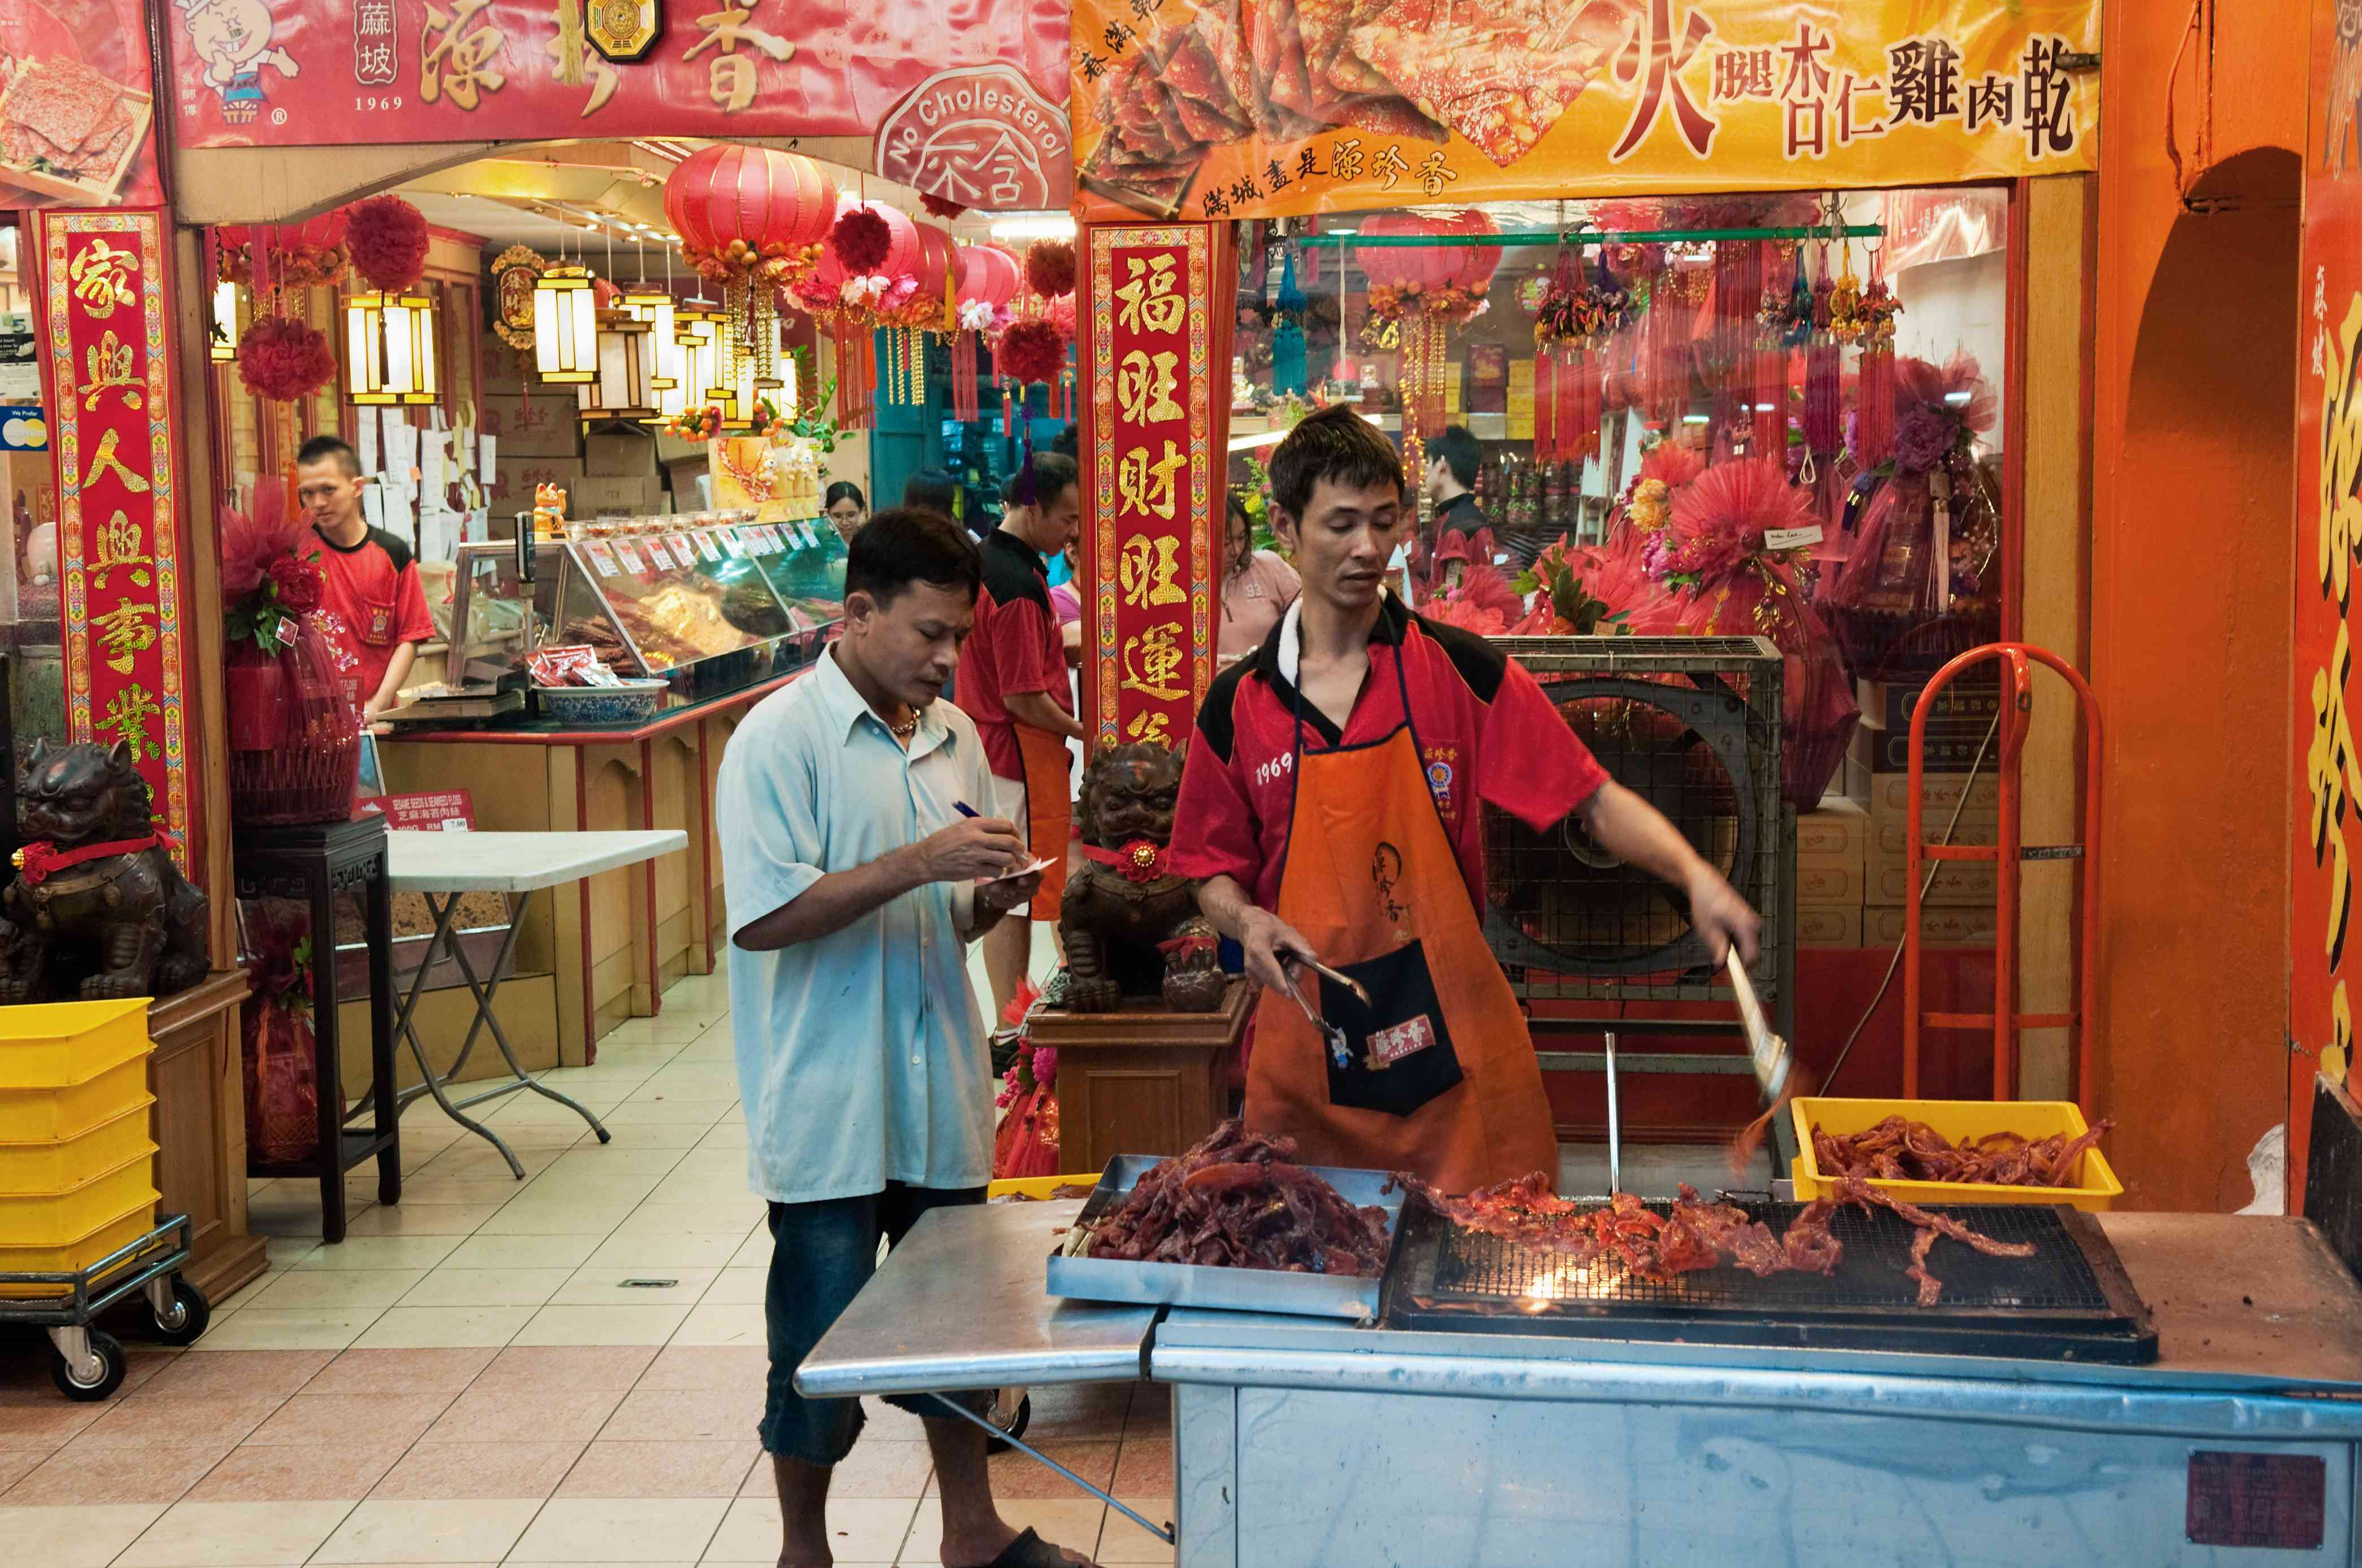 Man cooking in Chinatown, Kuala Lumpur